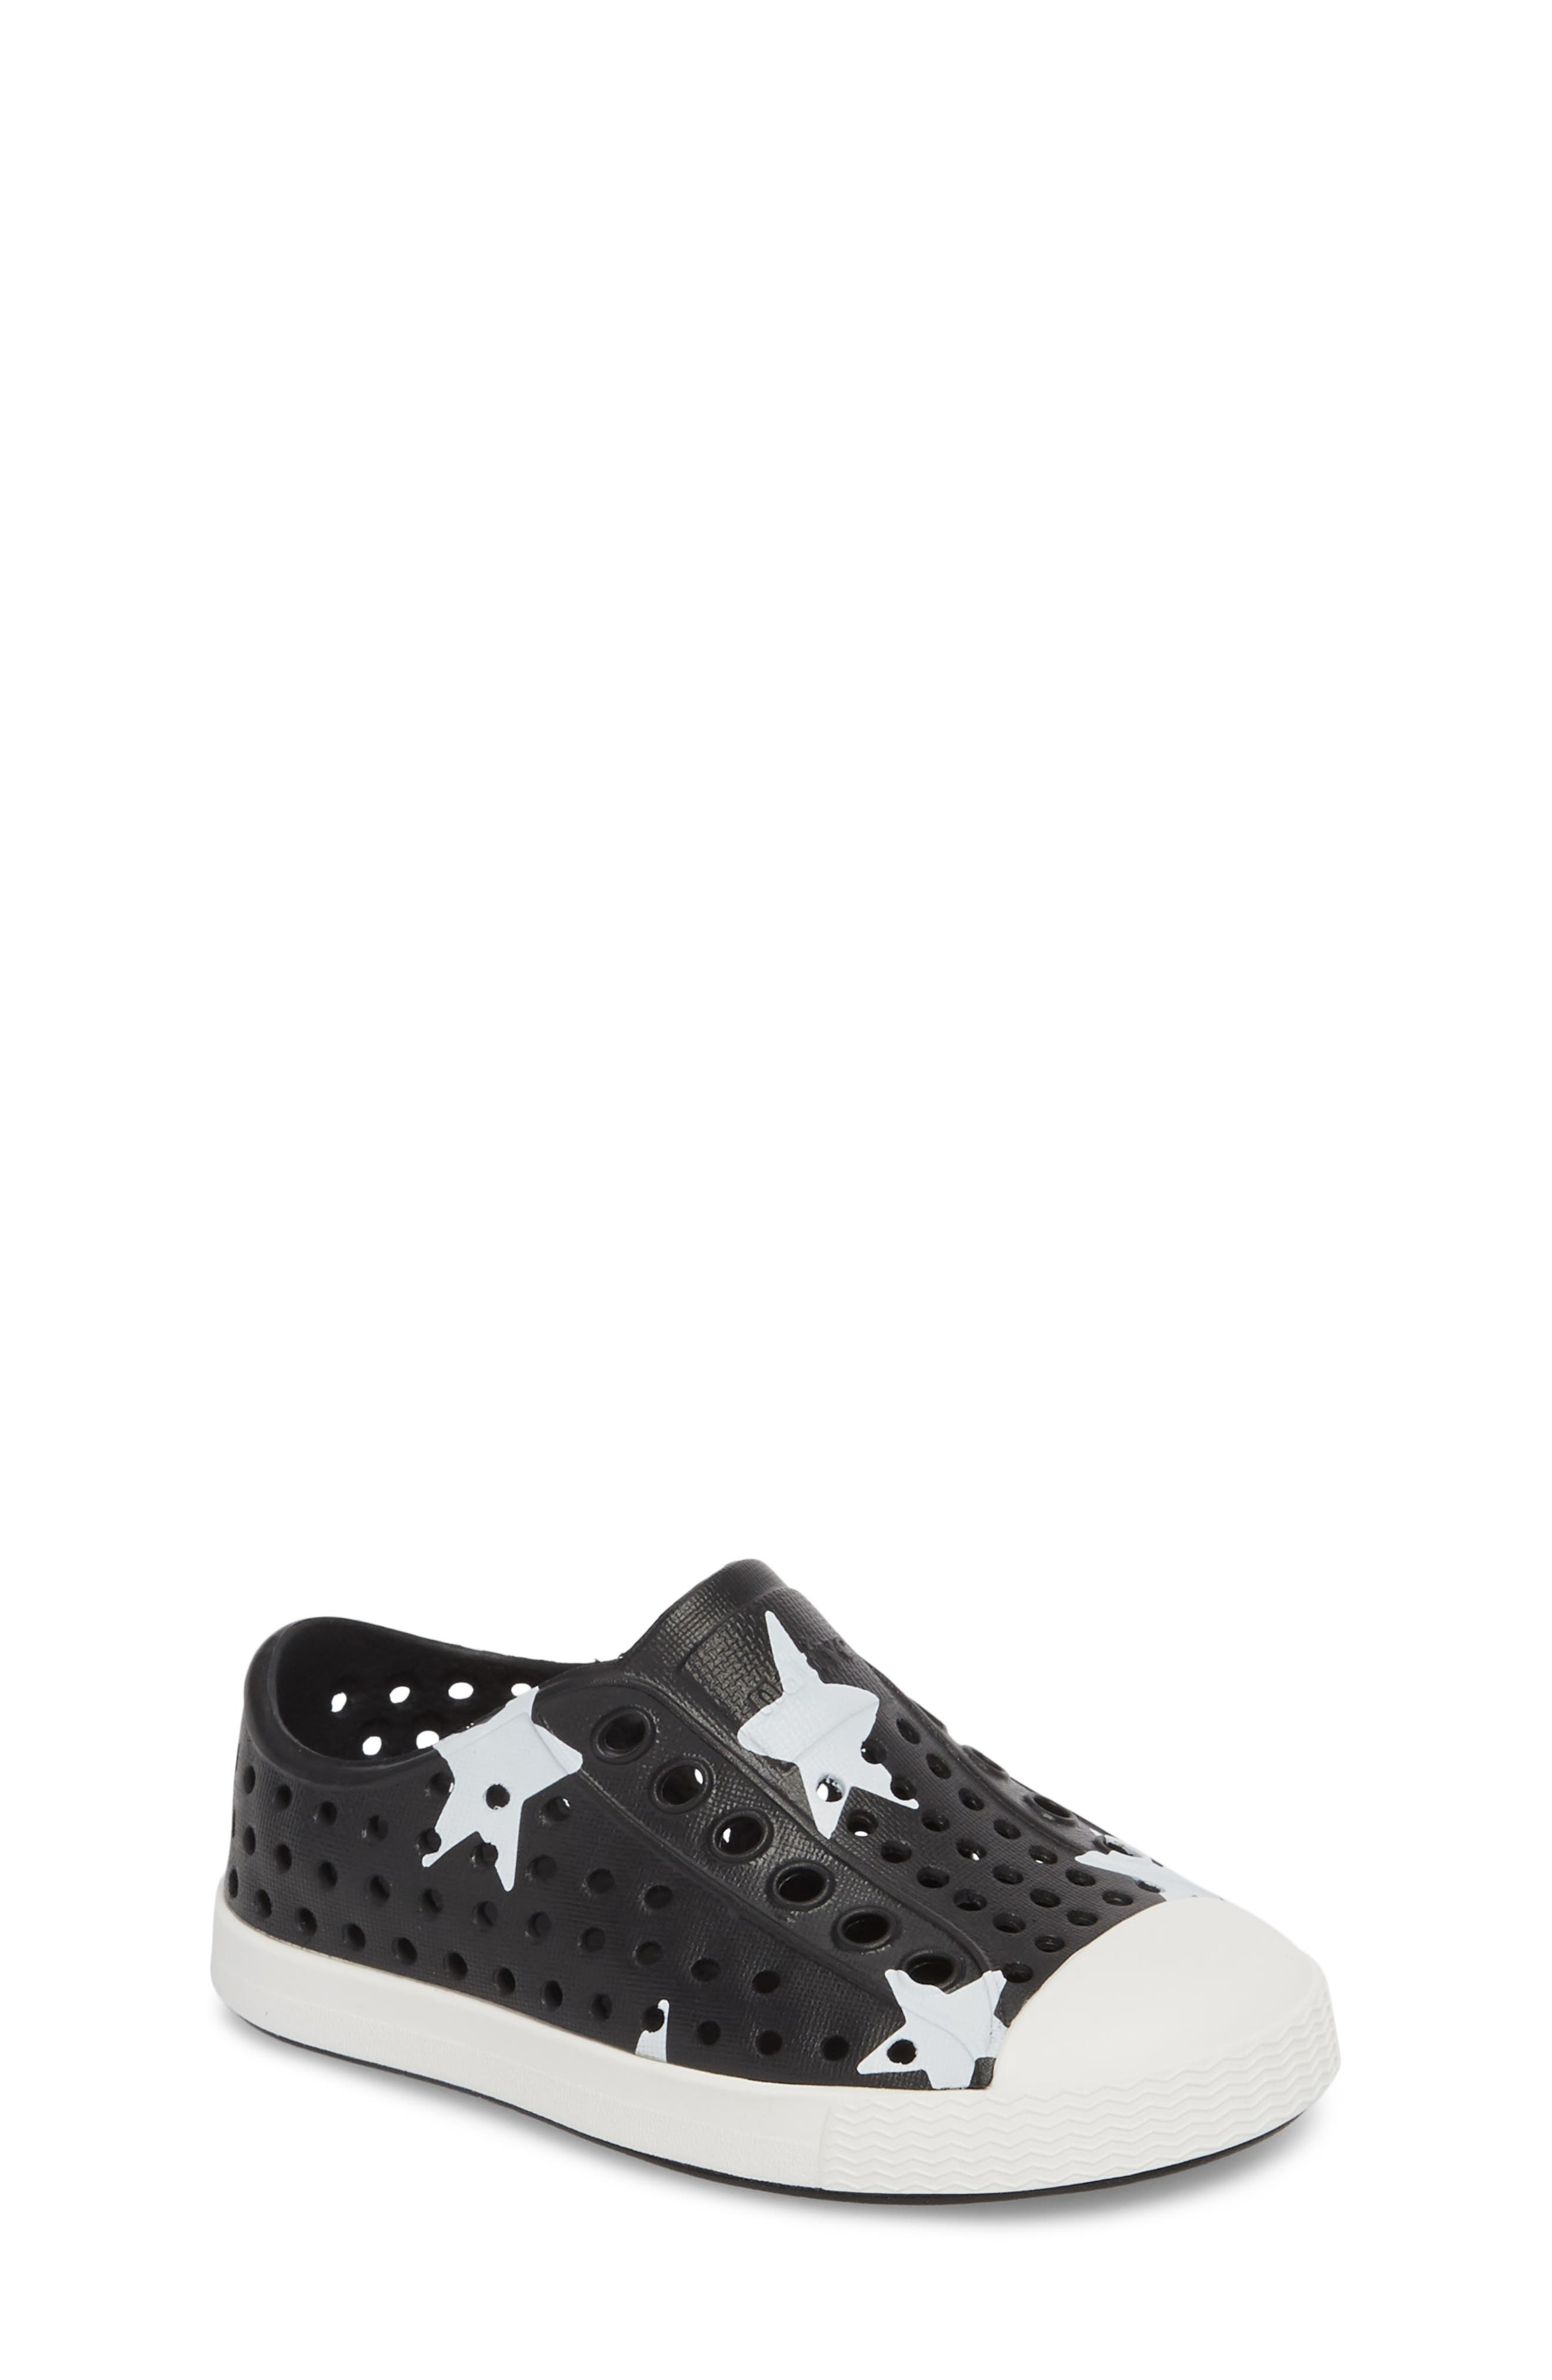 Native Shoes Jefferson Quartz Slip-On Sneaker